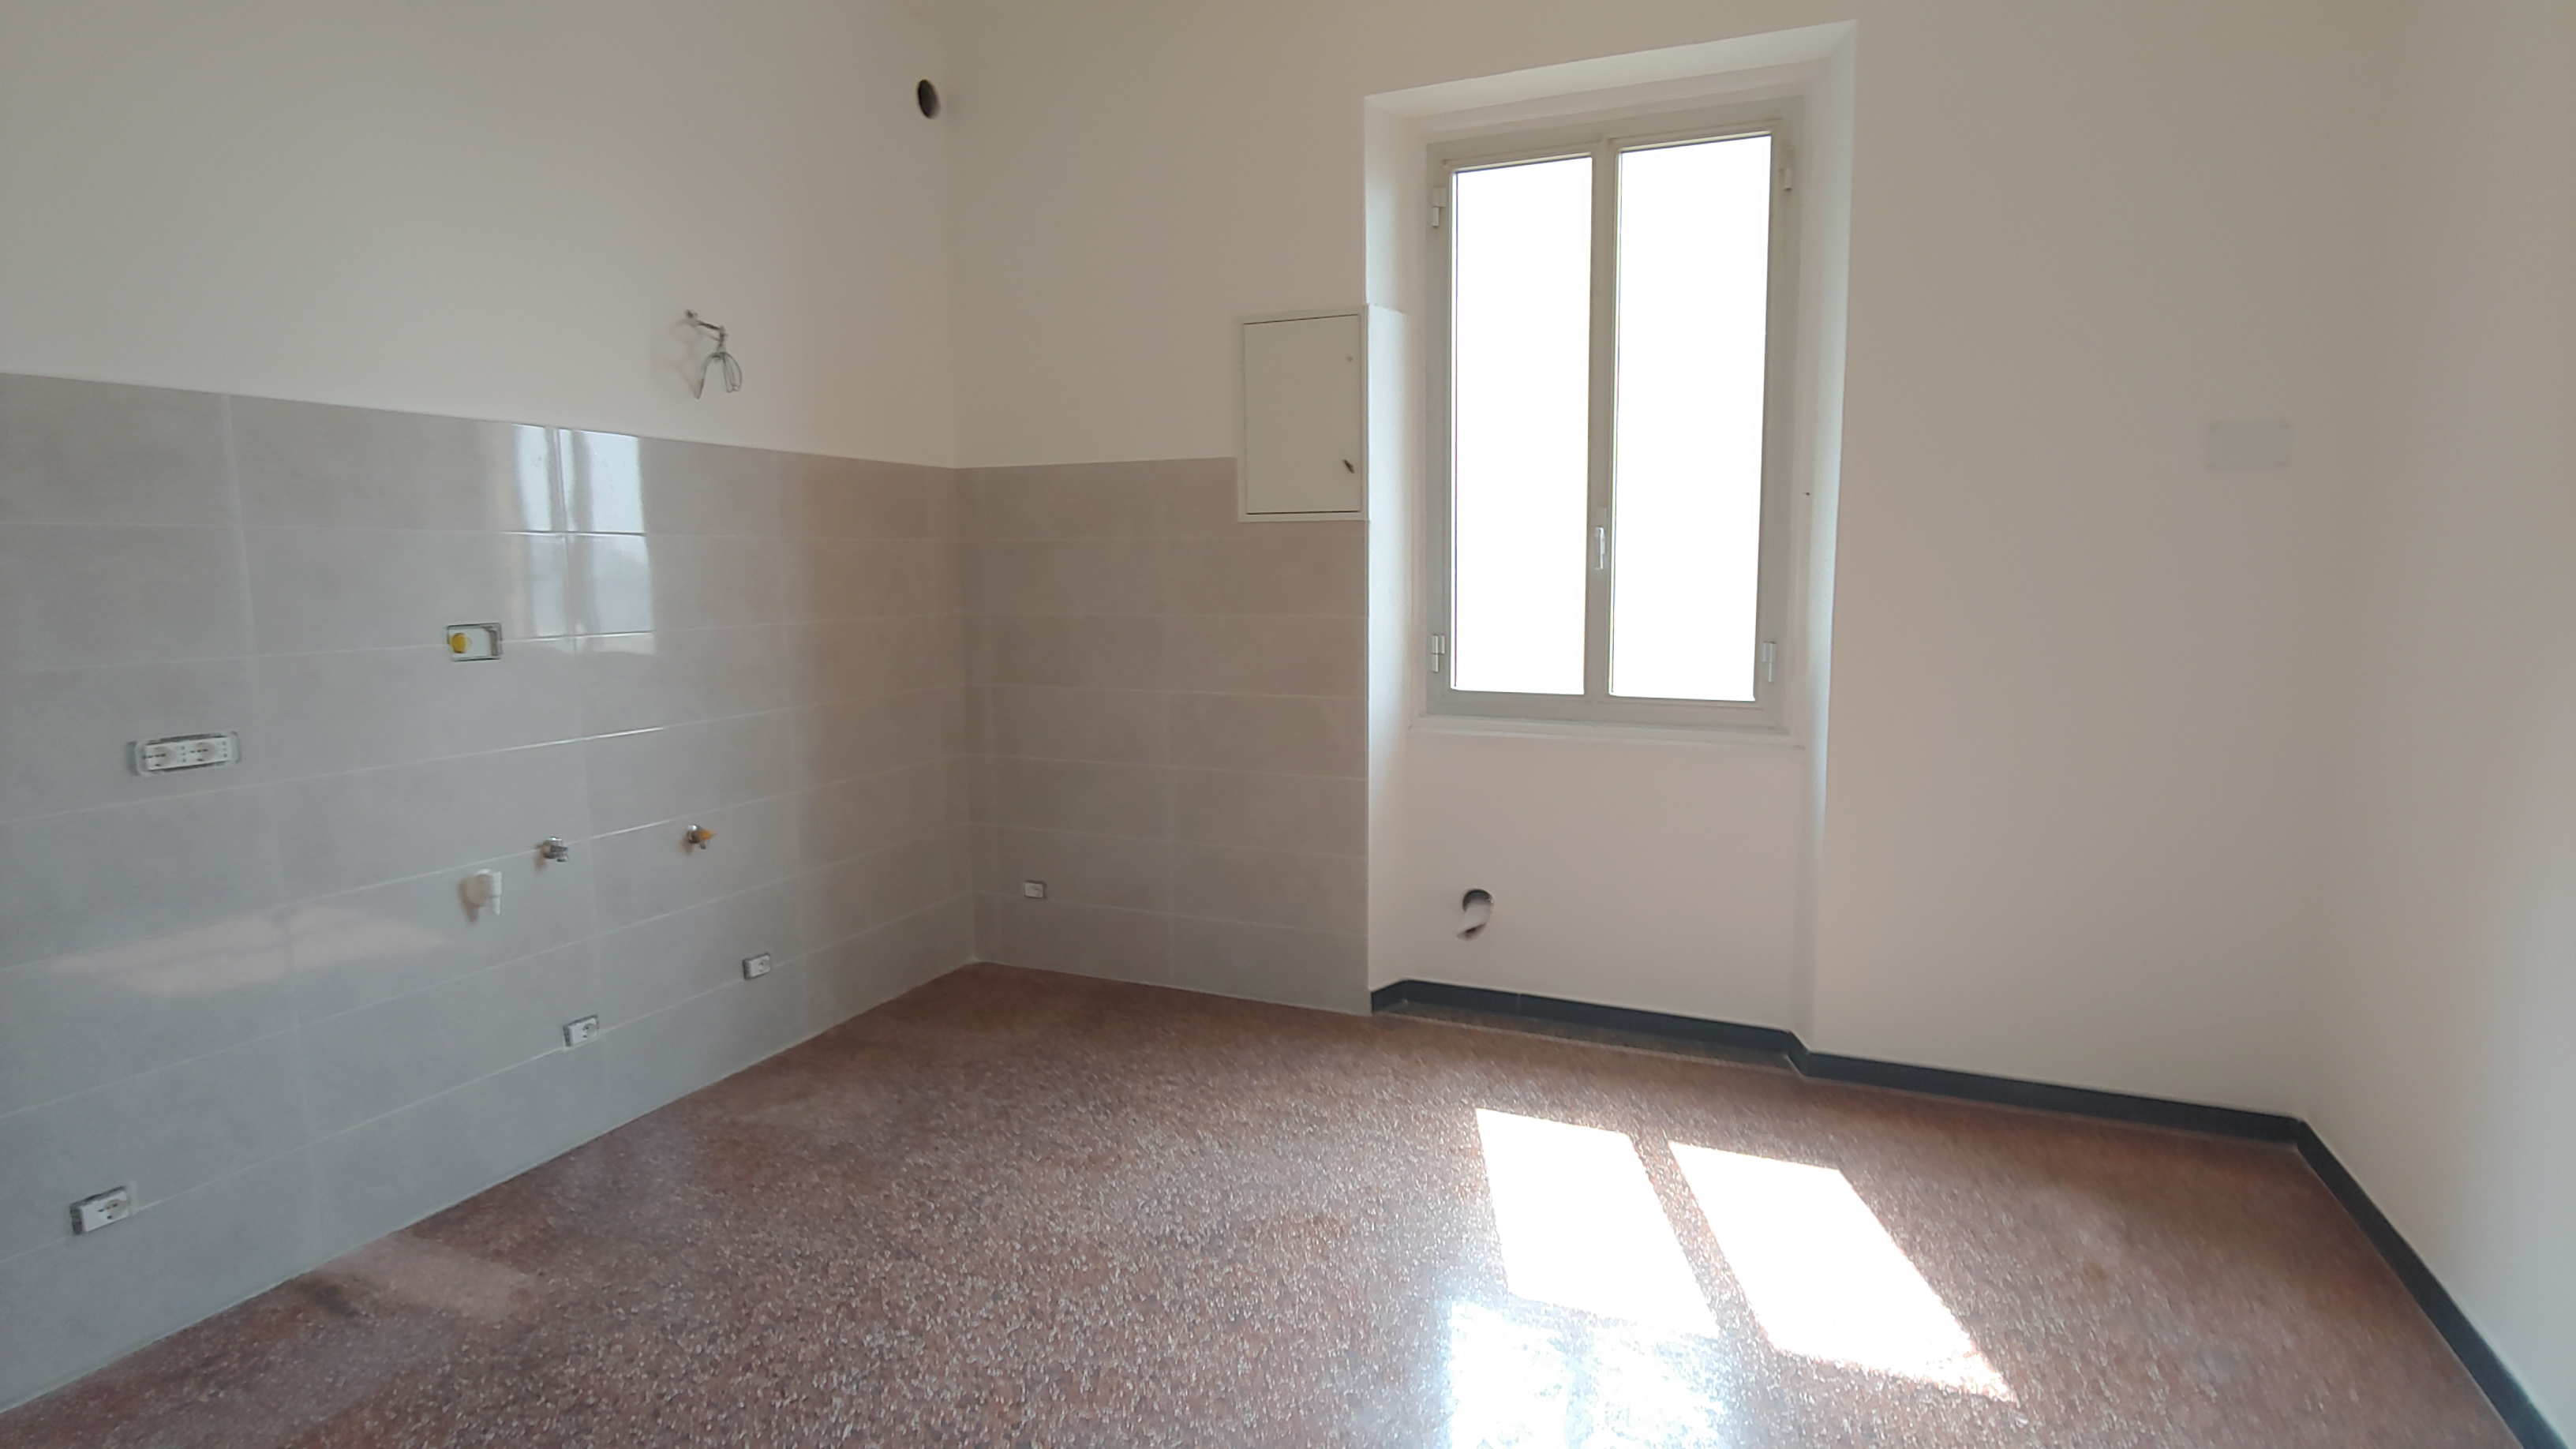 affitto appartamento via mansueto